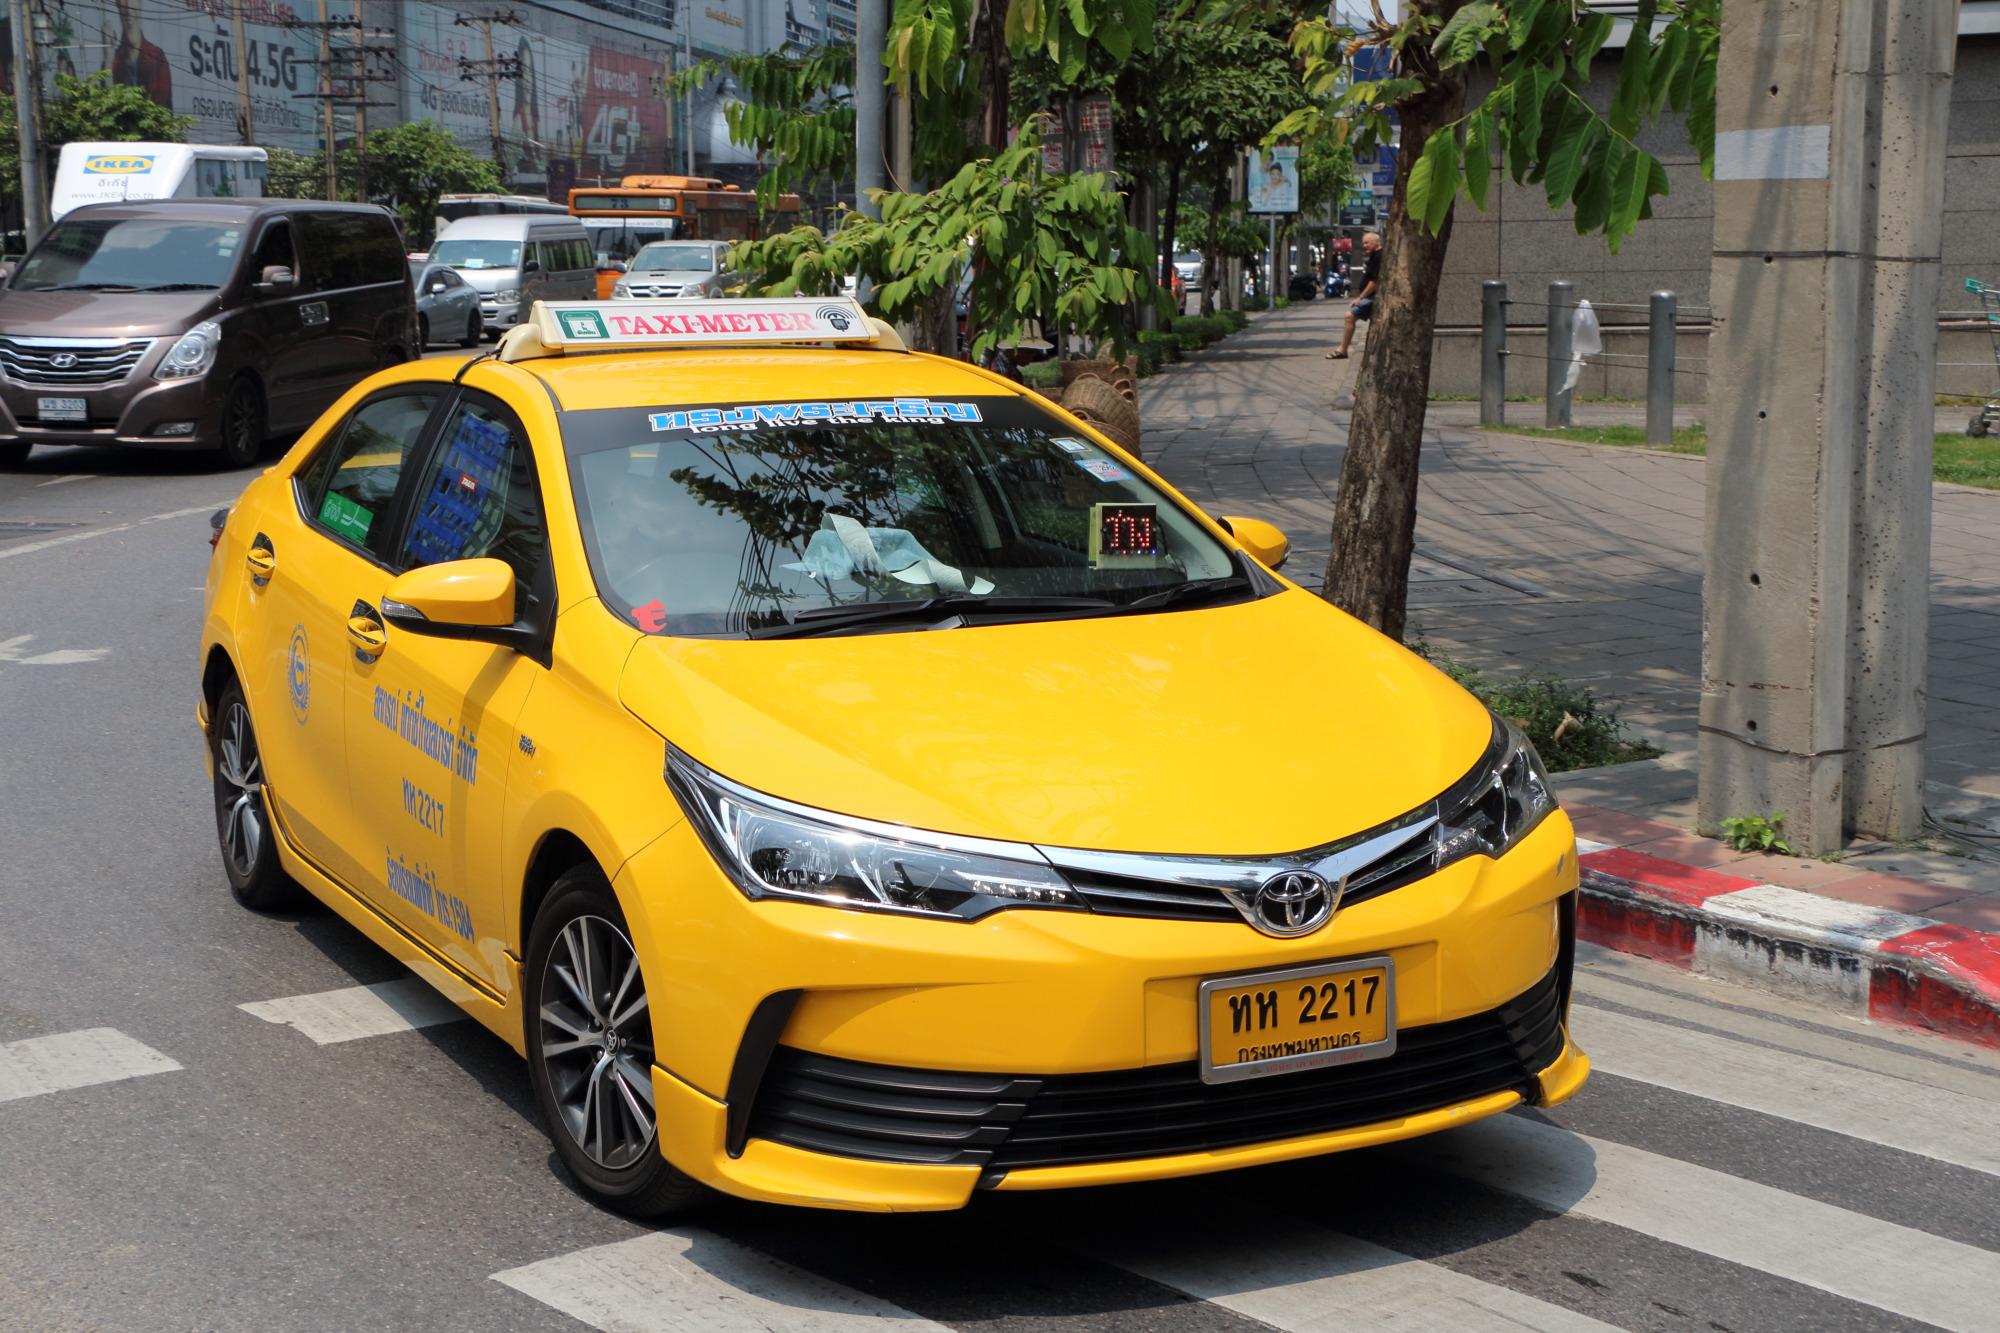 File:Taxi-meter in Bangkok 11 jpg - Wikimedia Commons